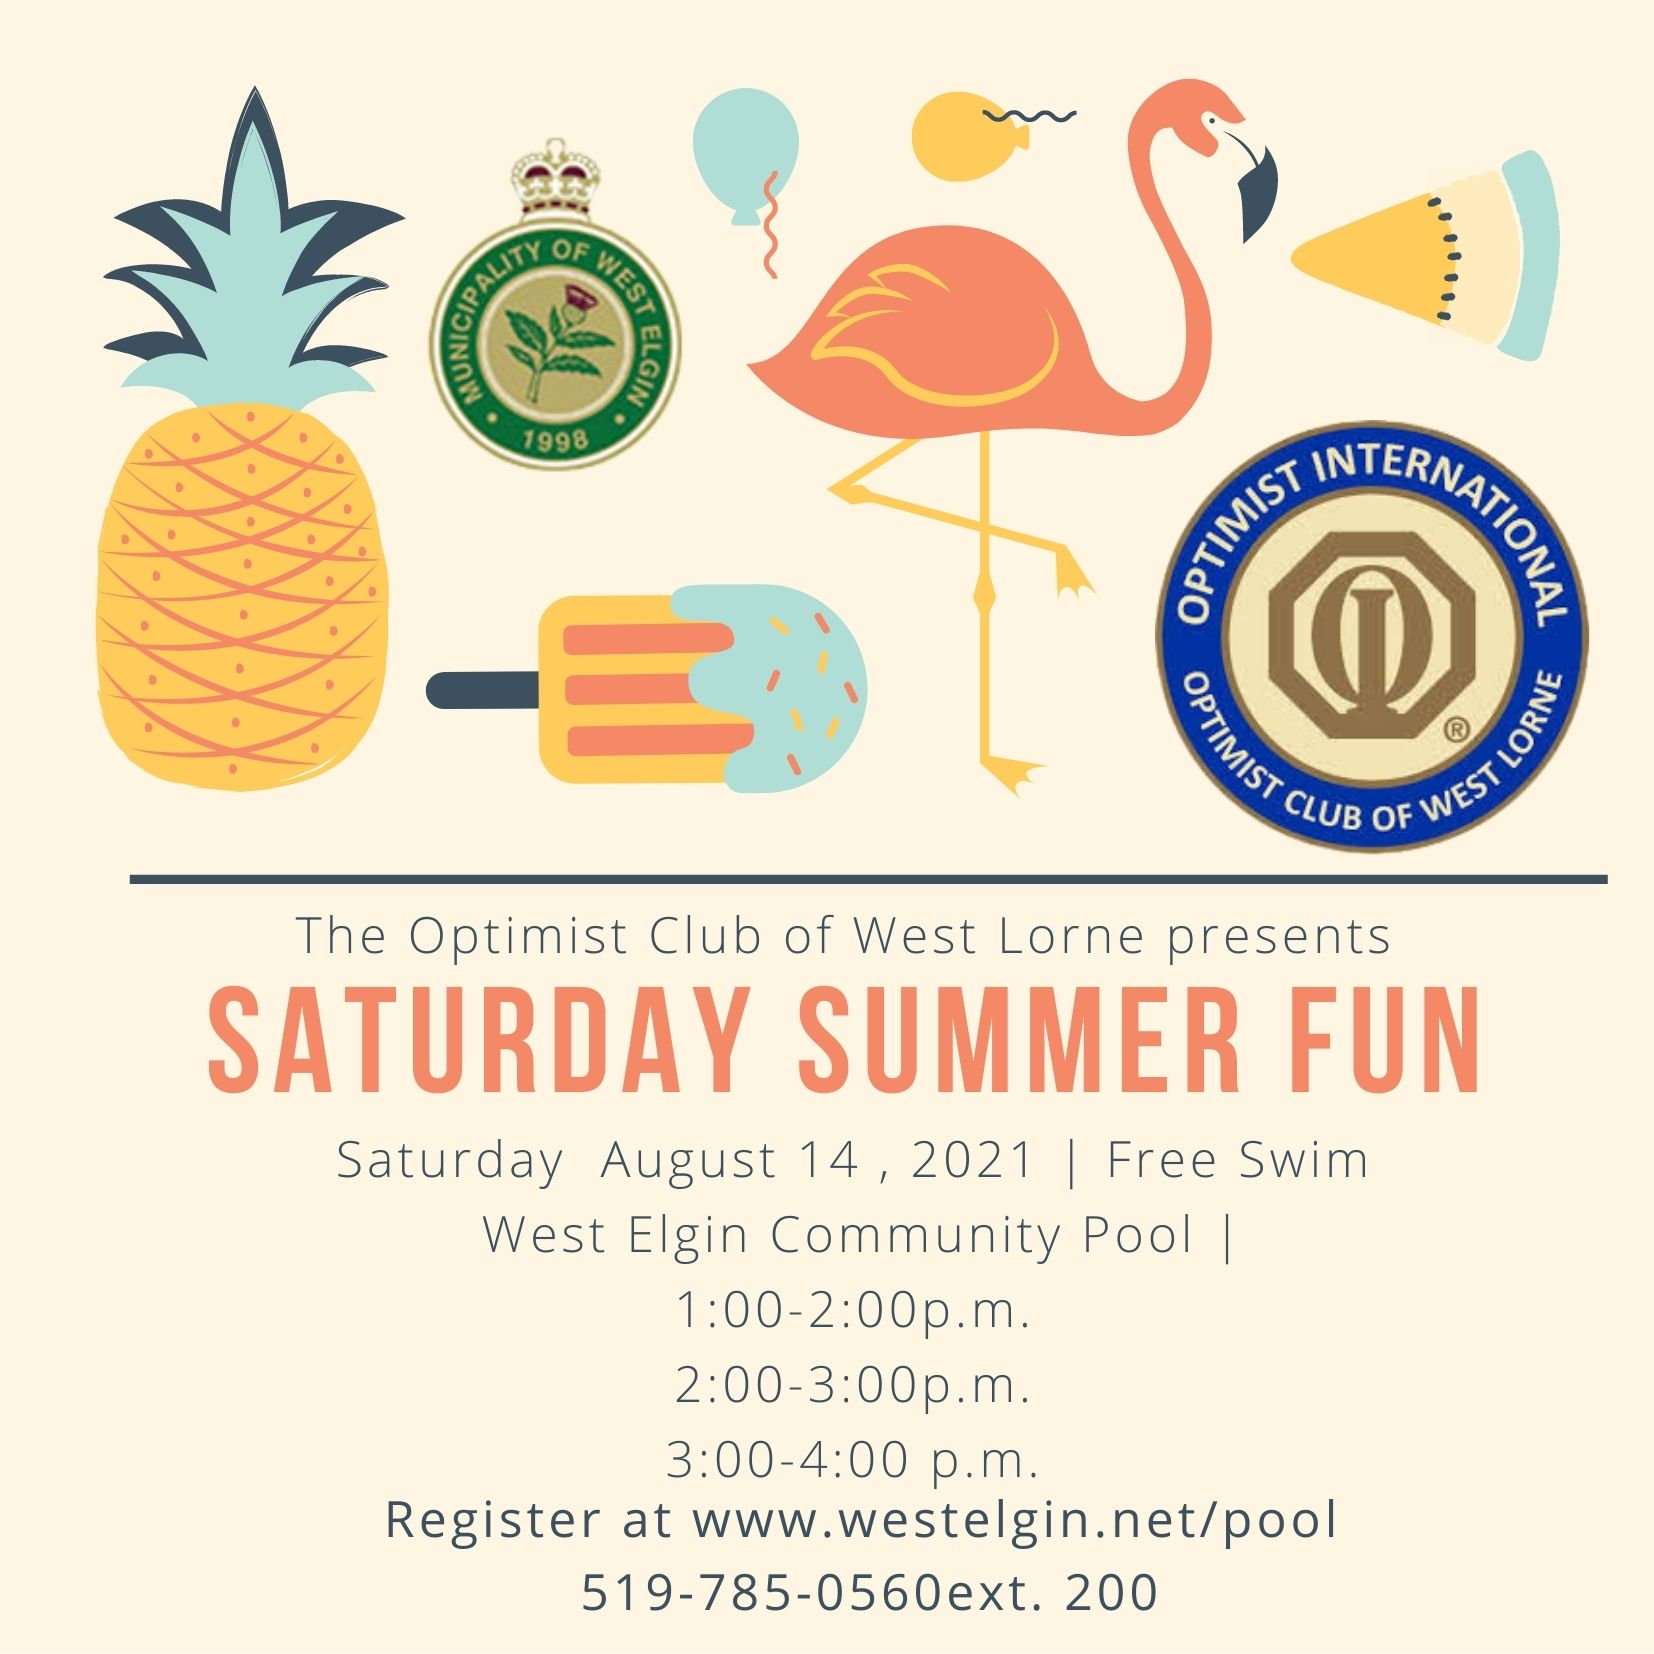 Saturday Summer Fun Poster